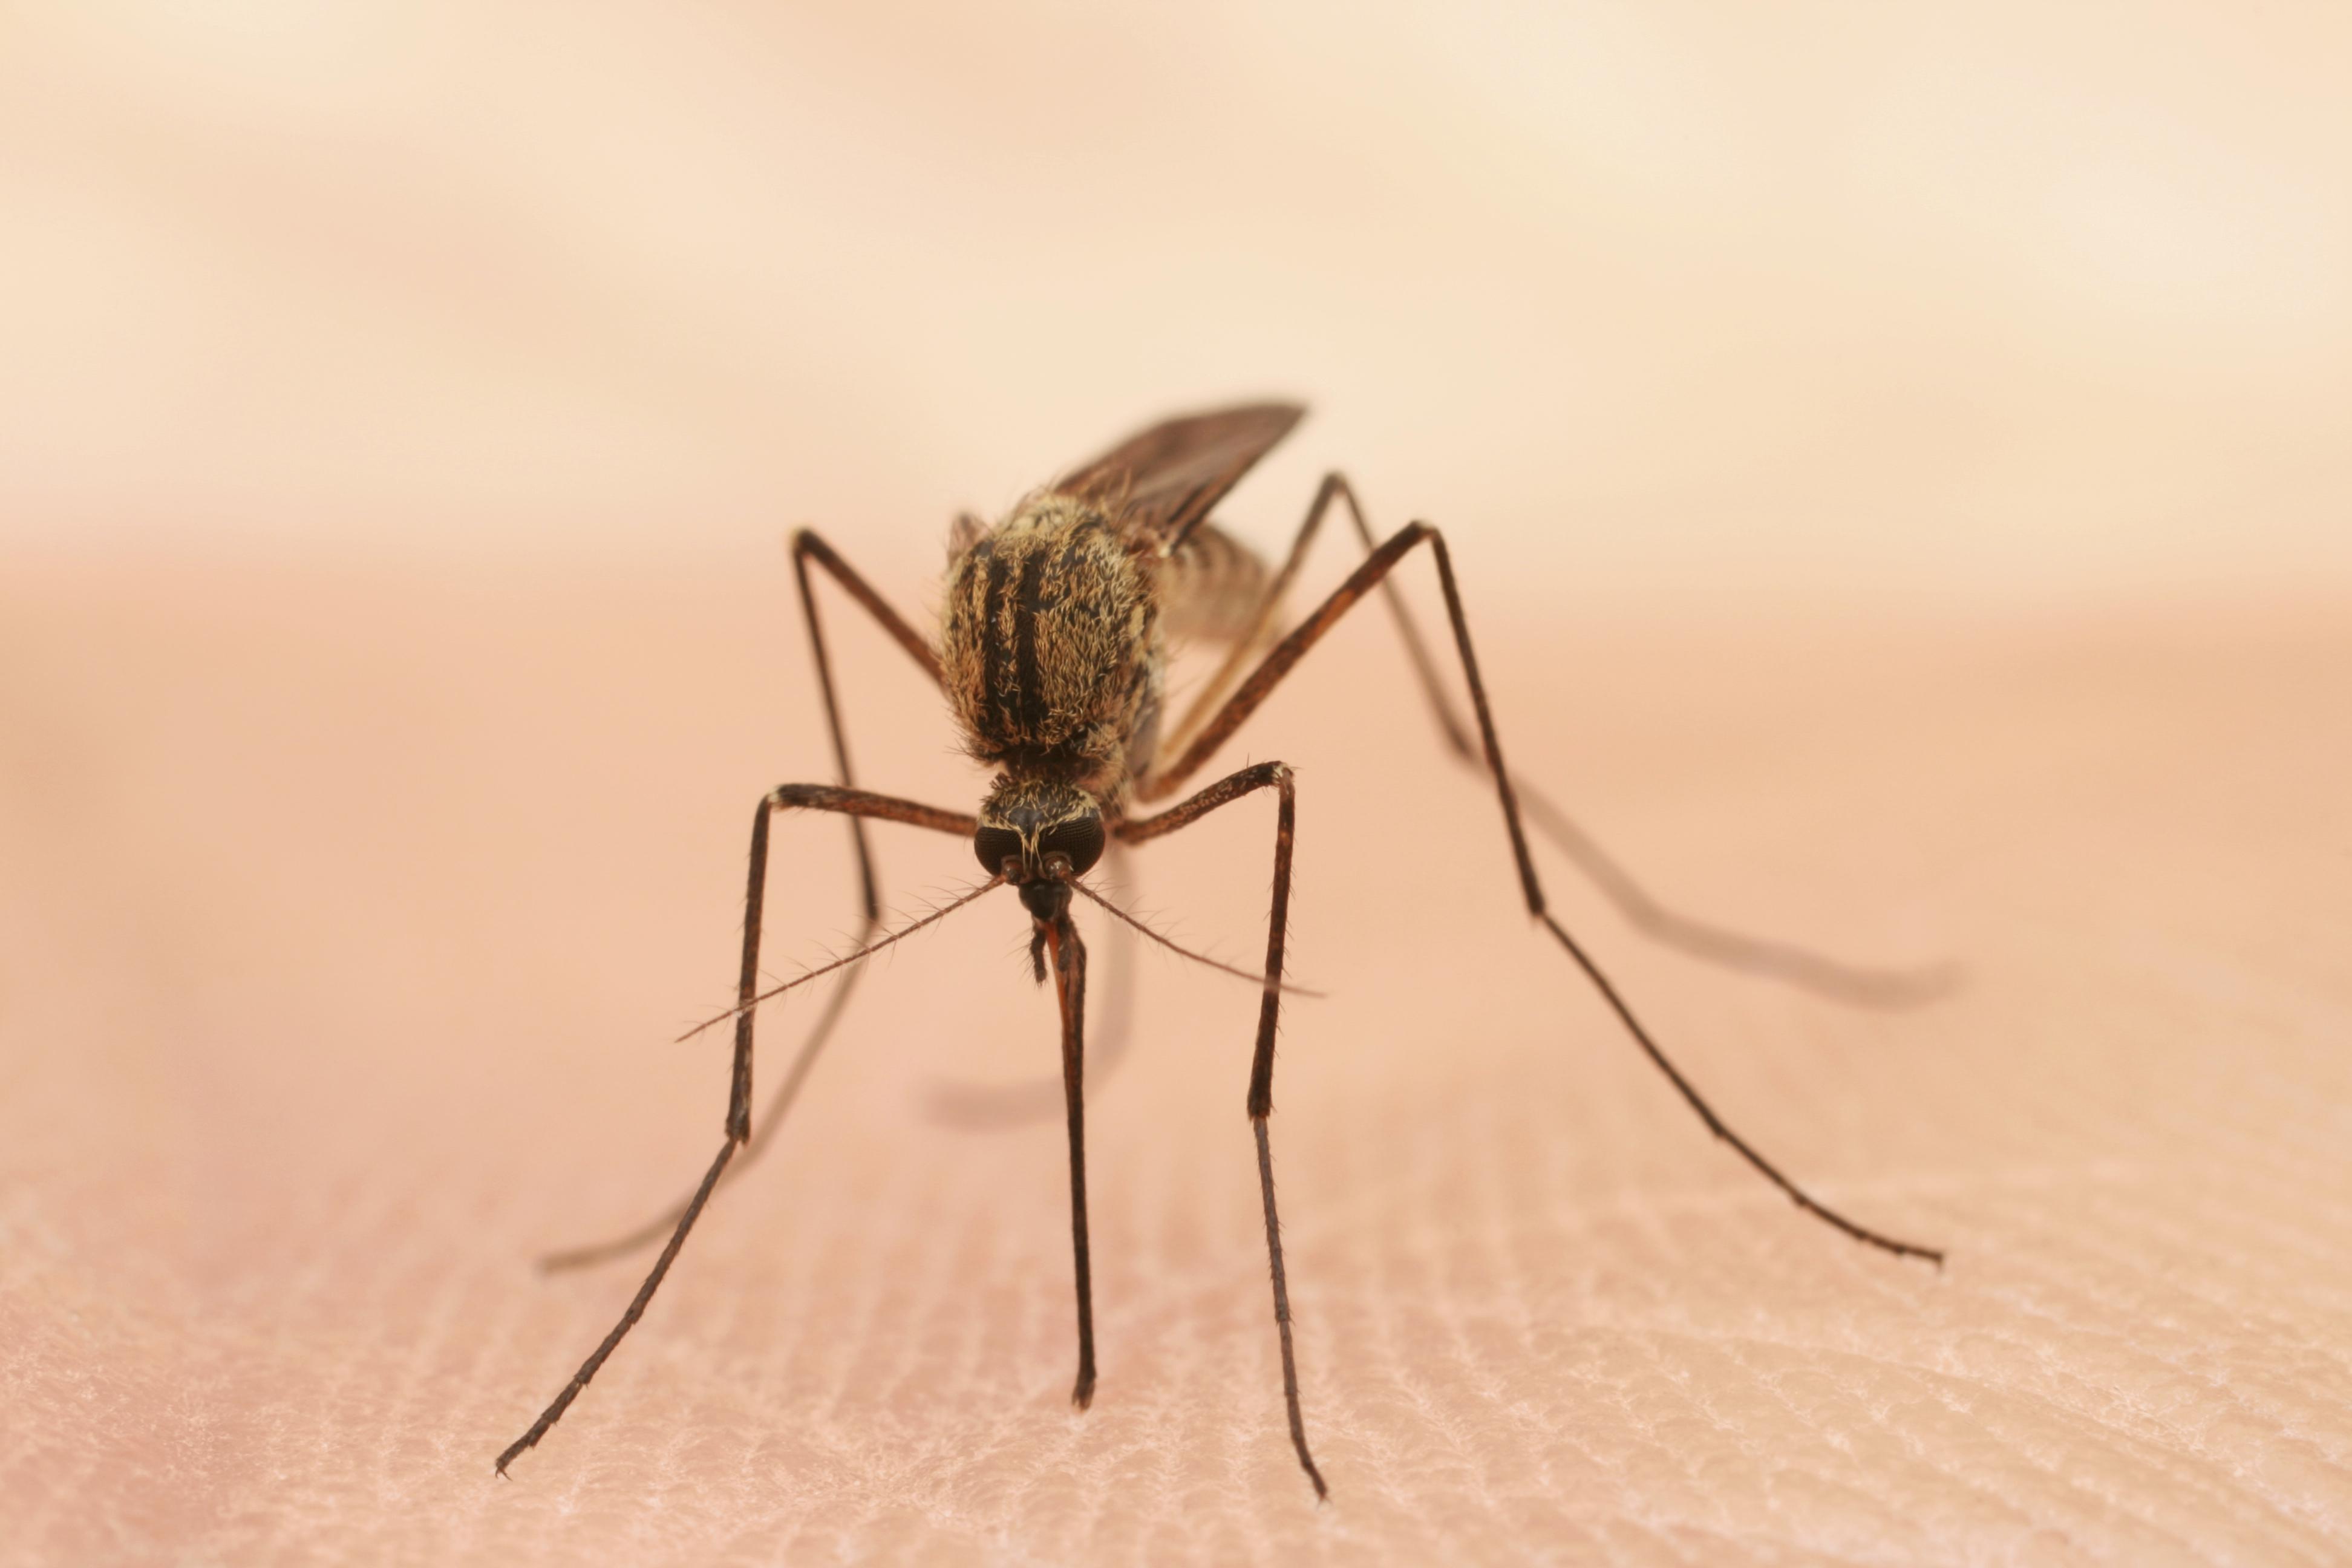 Mosquito Borne Chikungunya Virus Can Cause Brain Swelling Death